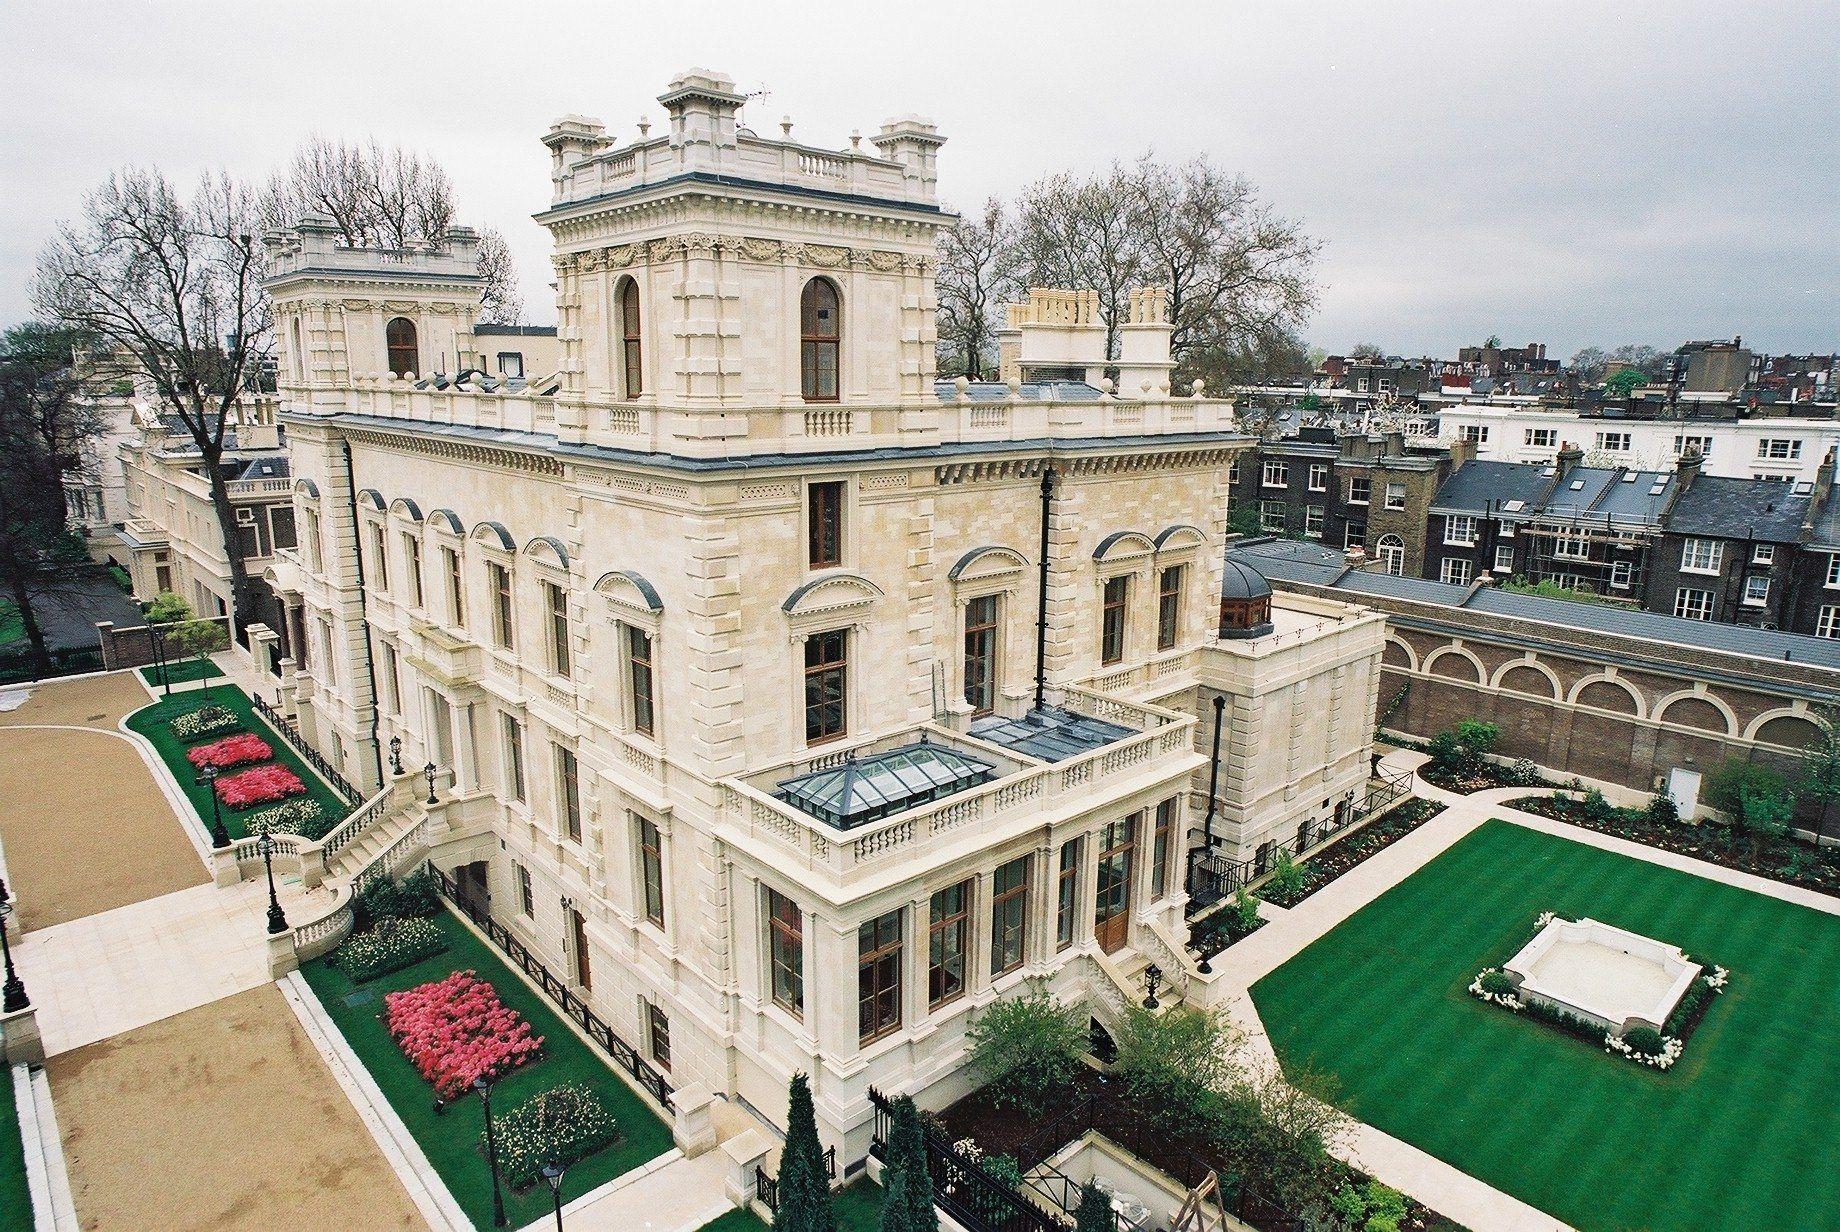 a29dcd0612eb6fe8f84ae42845d393c7 - Kensington Palace Gardens London Real Estate